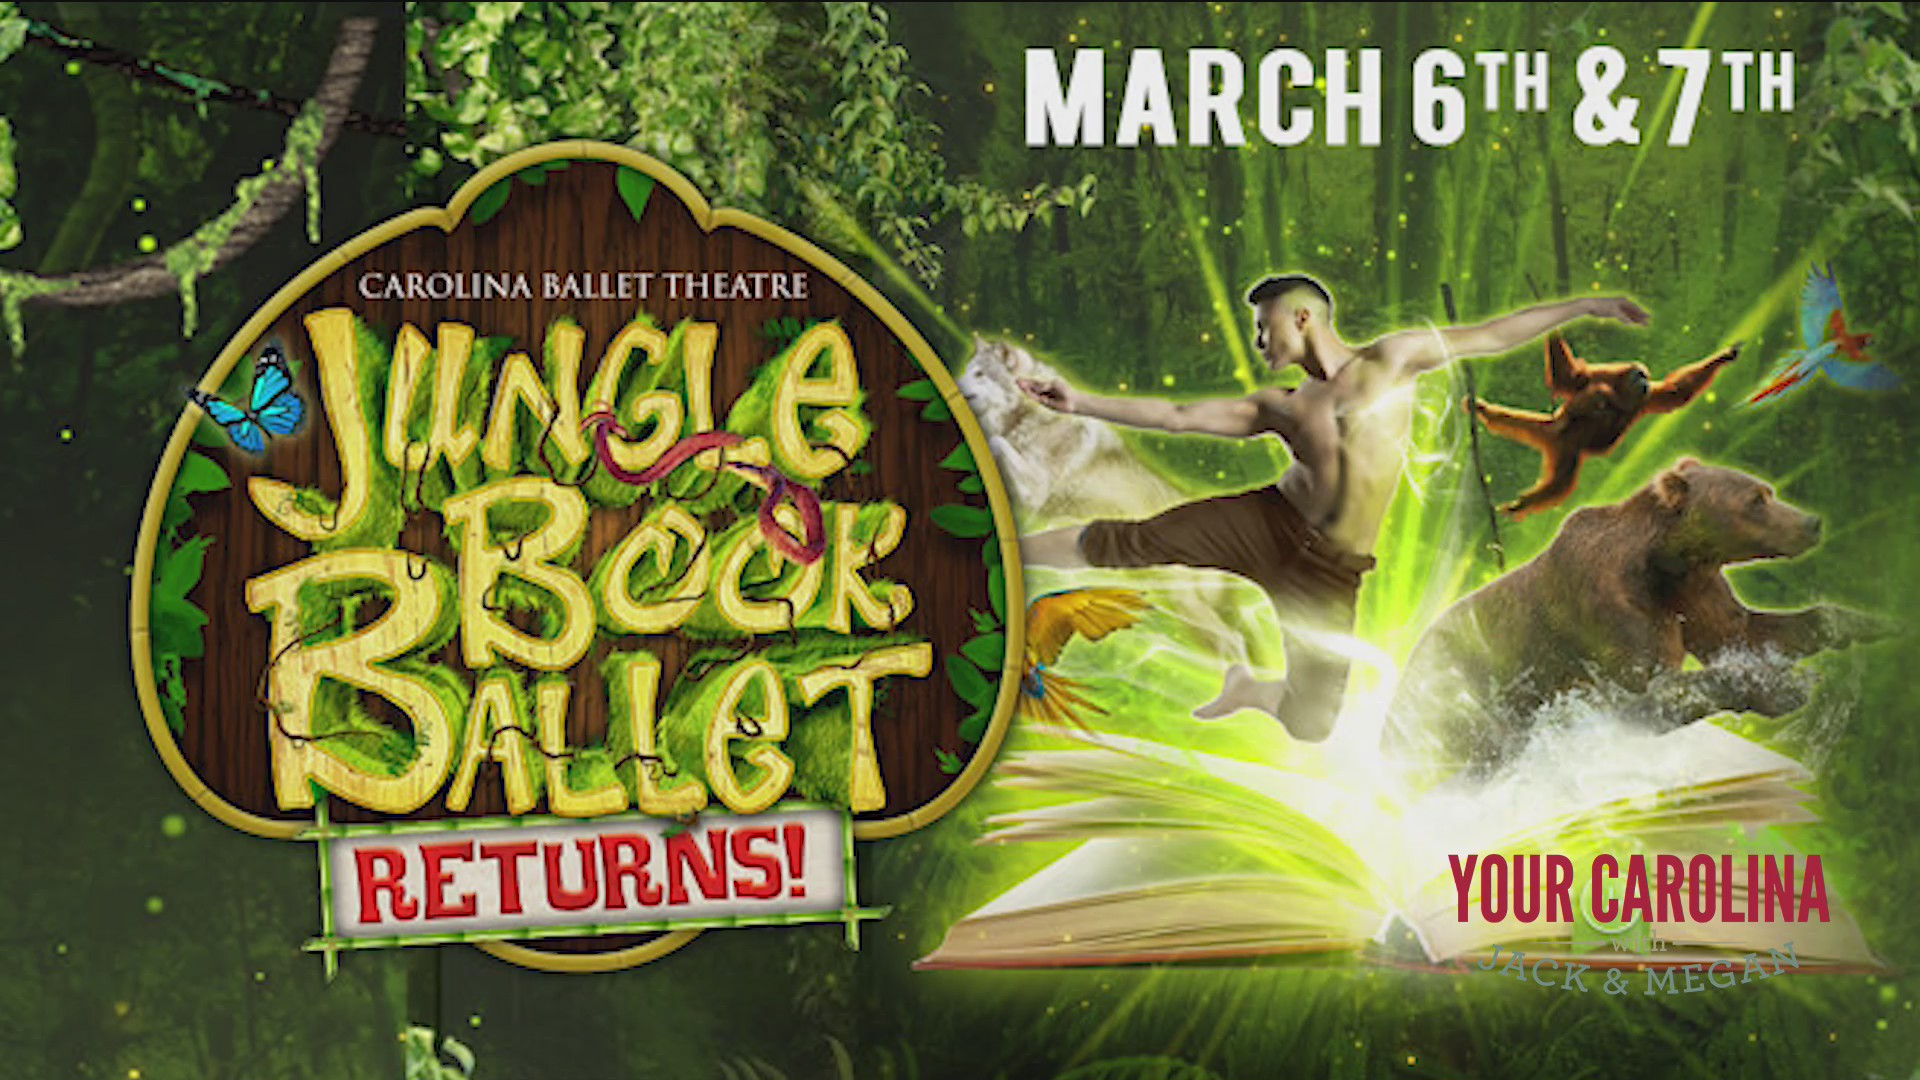 Carolina Ballet Theatre's Jungle Book Ballet Returns